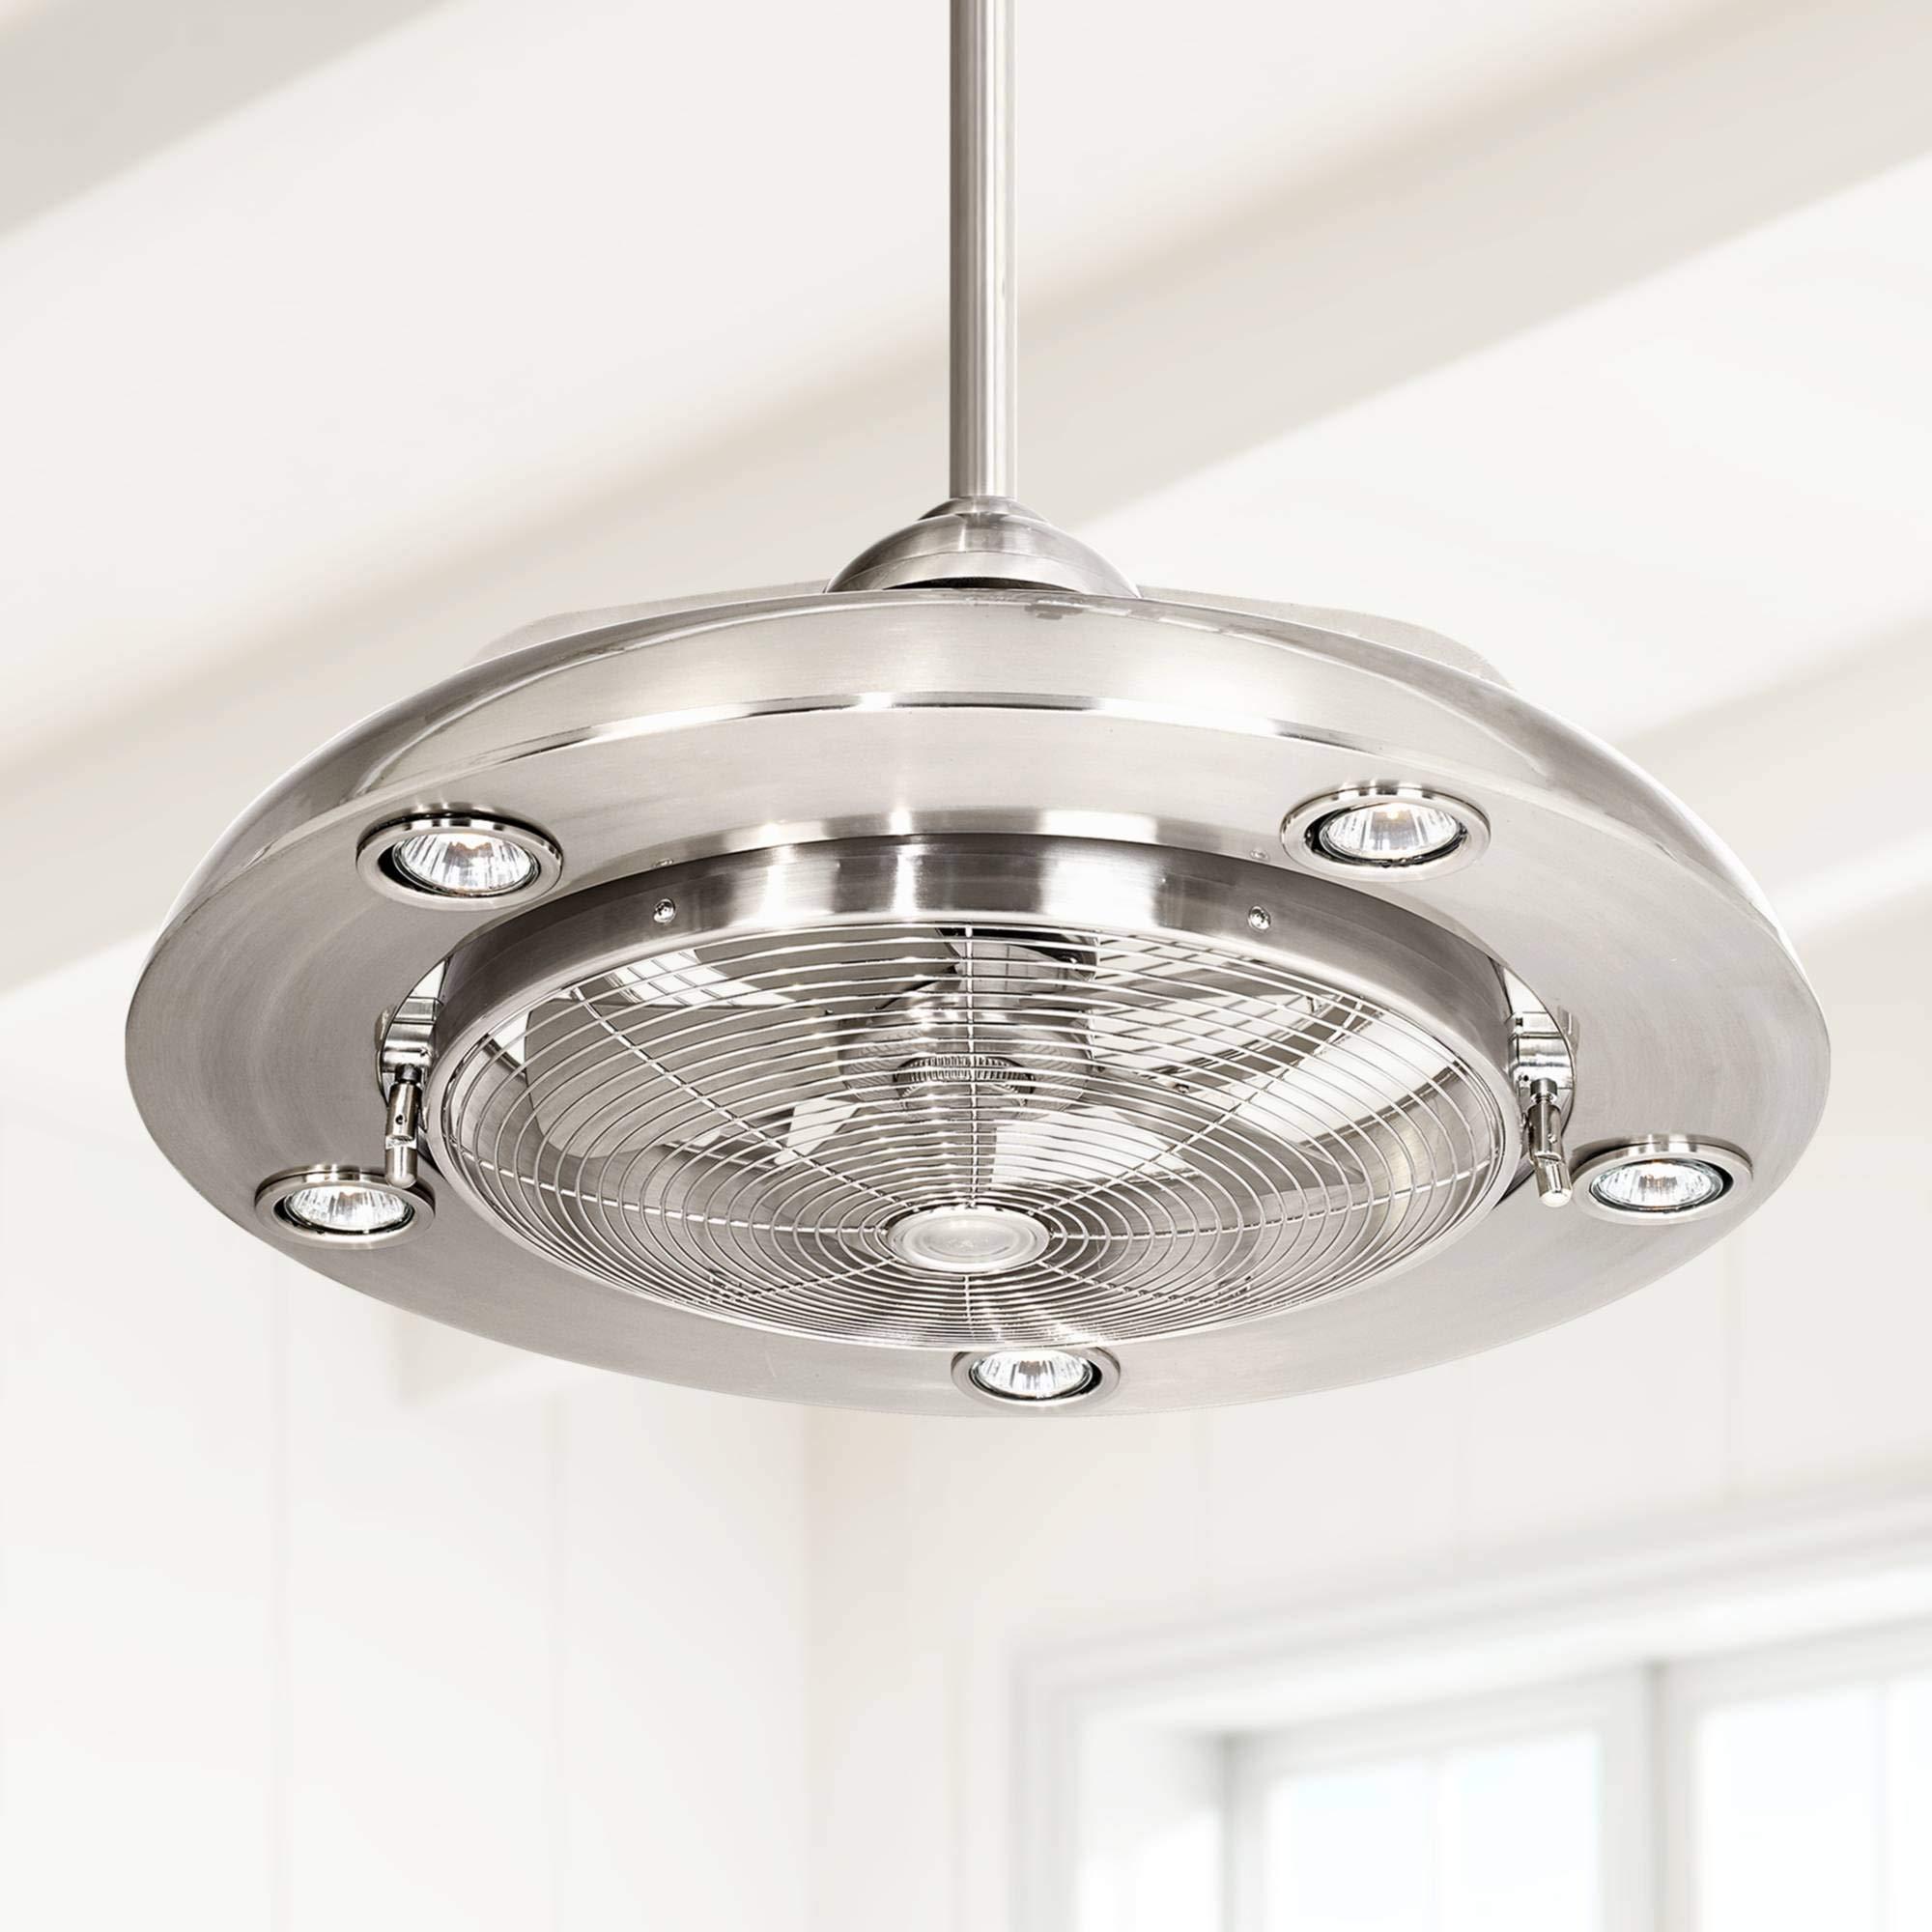 24'' Segue Possini LED Brushed Nickel Ceiling Fan - Possini Euro Design